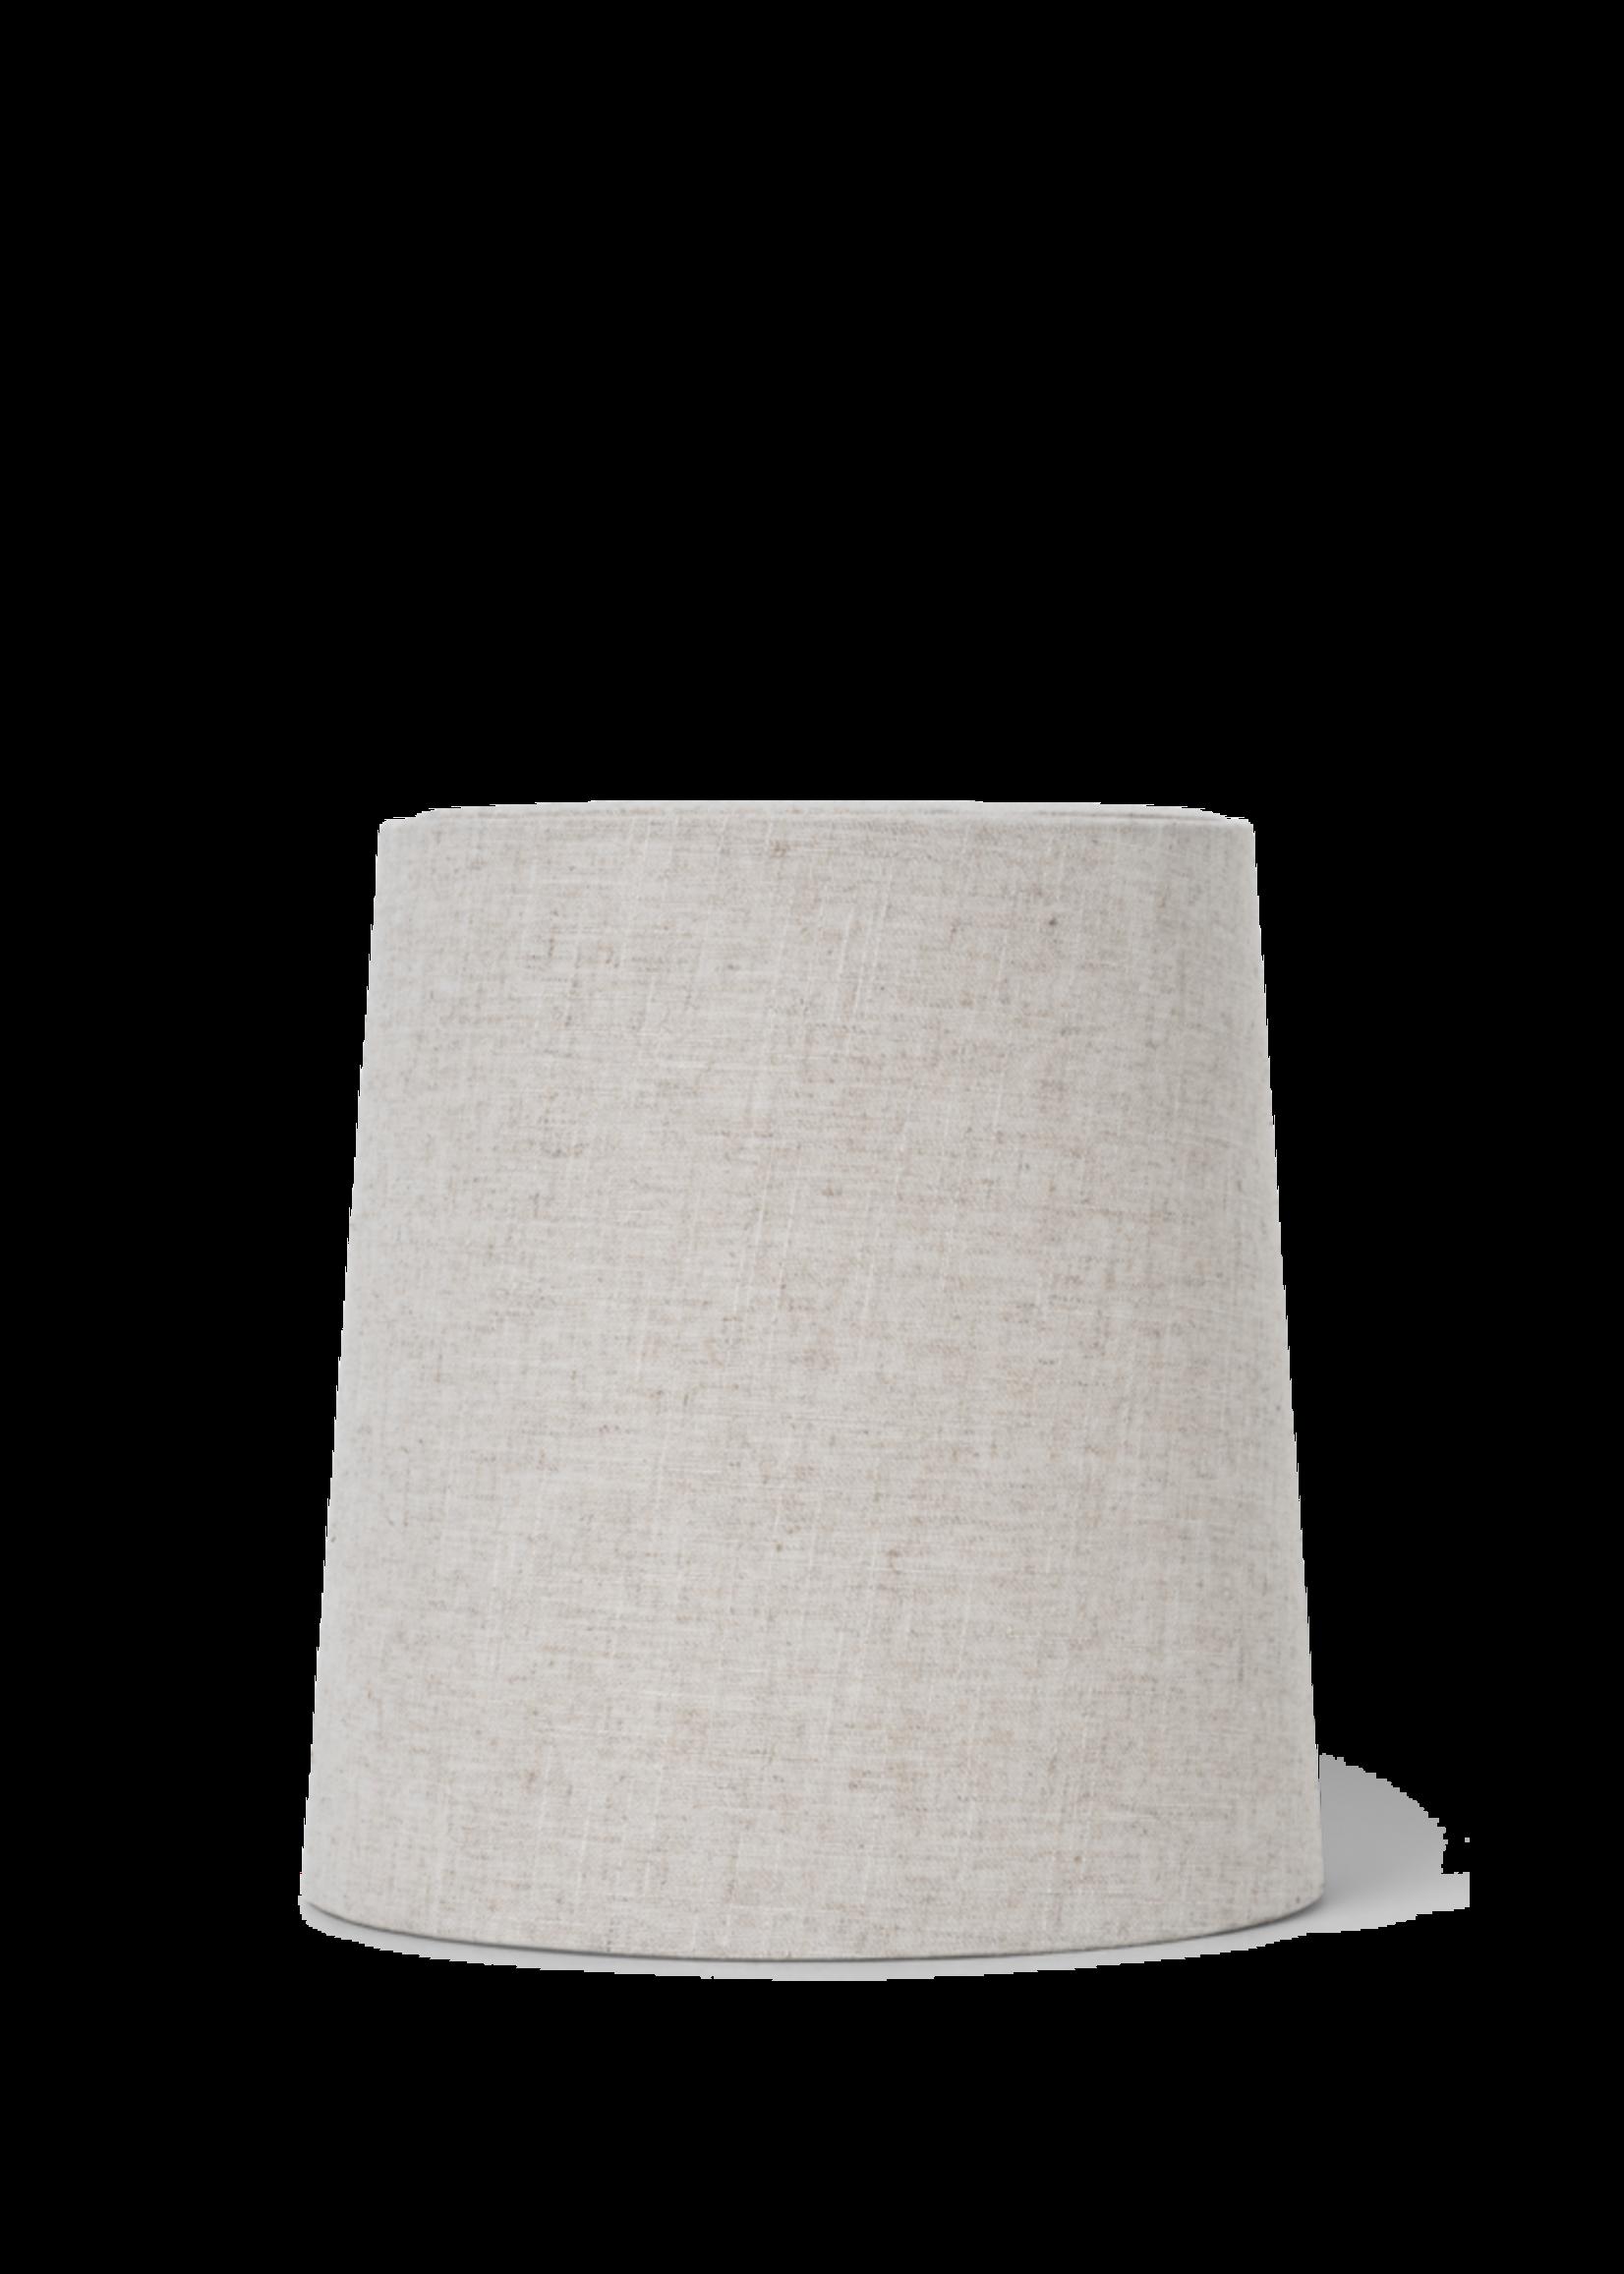 ferm LIVING ferm LIVING Hebe Lamp Shade - Medium